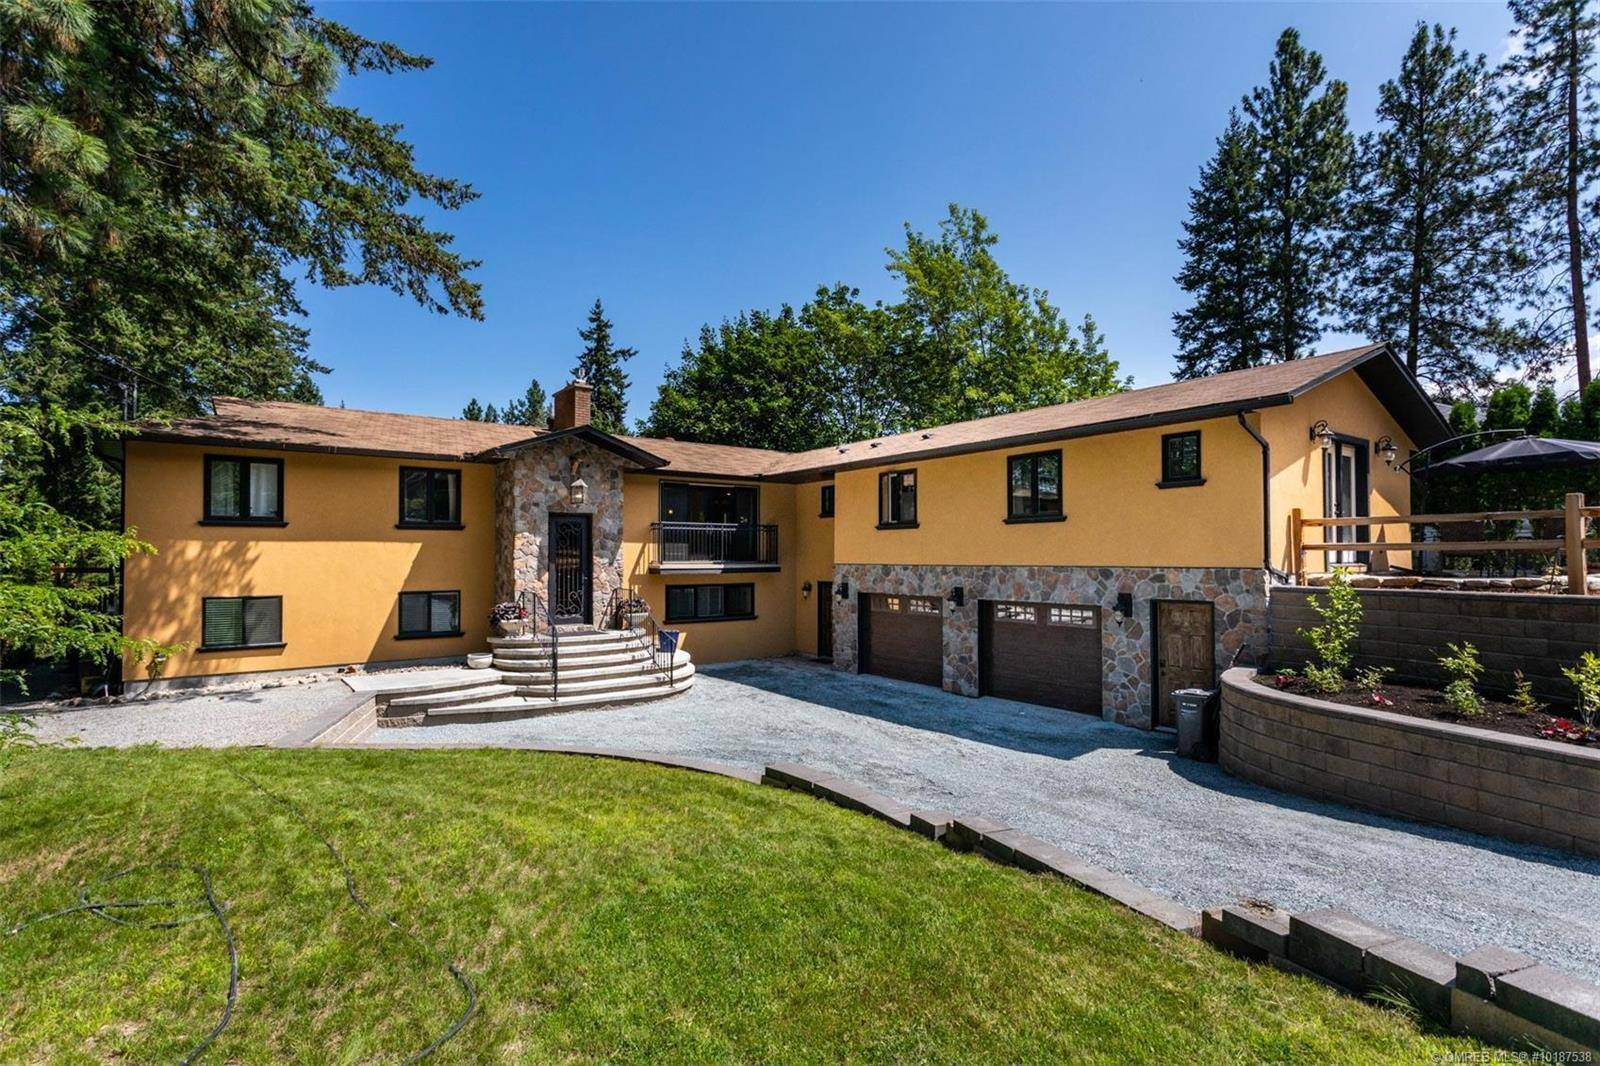 House for sale at 872 Paret Rd Kelowna British Columbia - MLS: 10187538